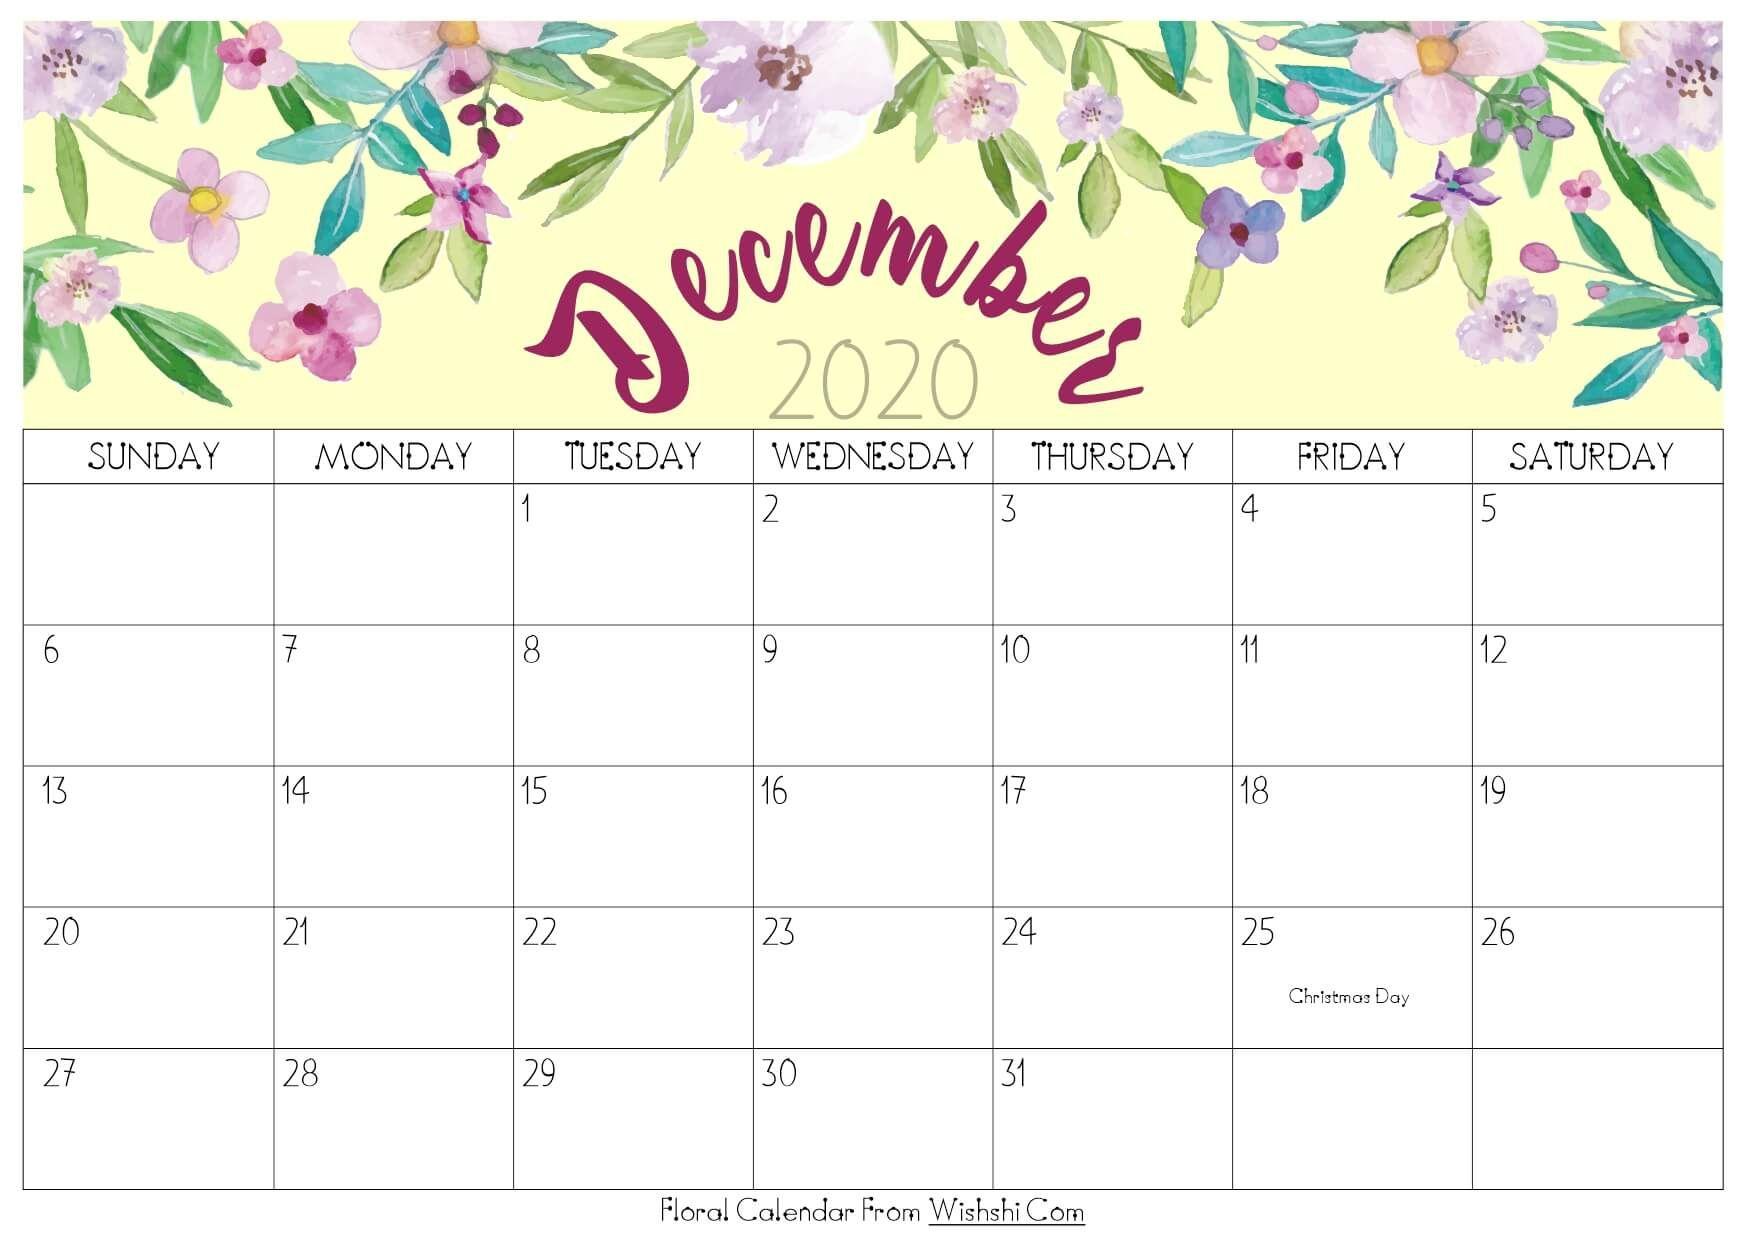 Free Whimsical Christmas Theme 2021 December Printable Calendar Cute December 2020 Calendar Printable Calendar Printables Print Calendar Calendar